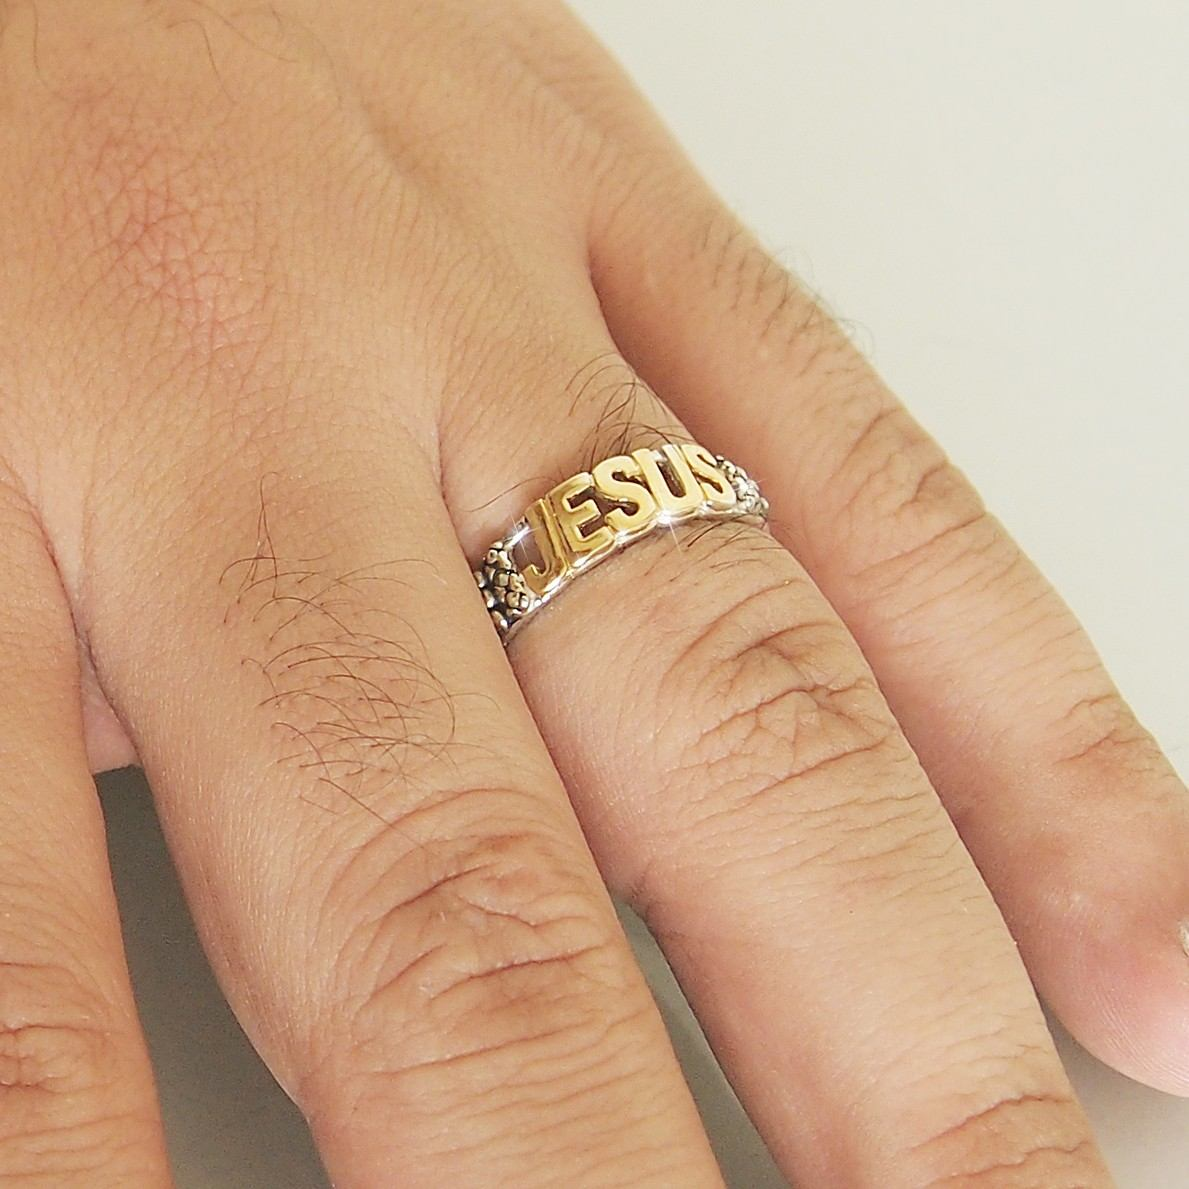 9040352b008 anel jesus prata 925 + banho de ouro 18k masculino  feminino. Carregando  zoom.